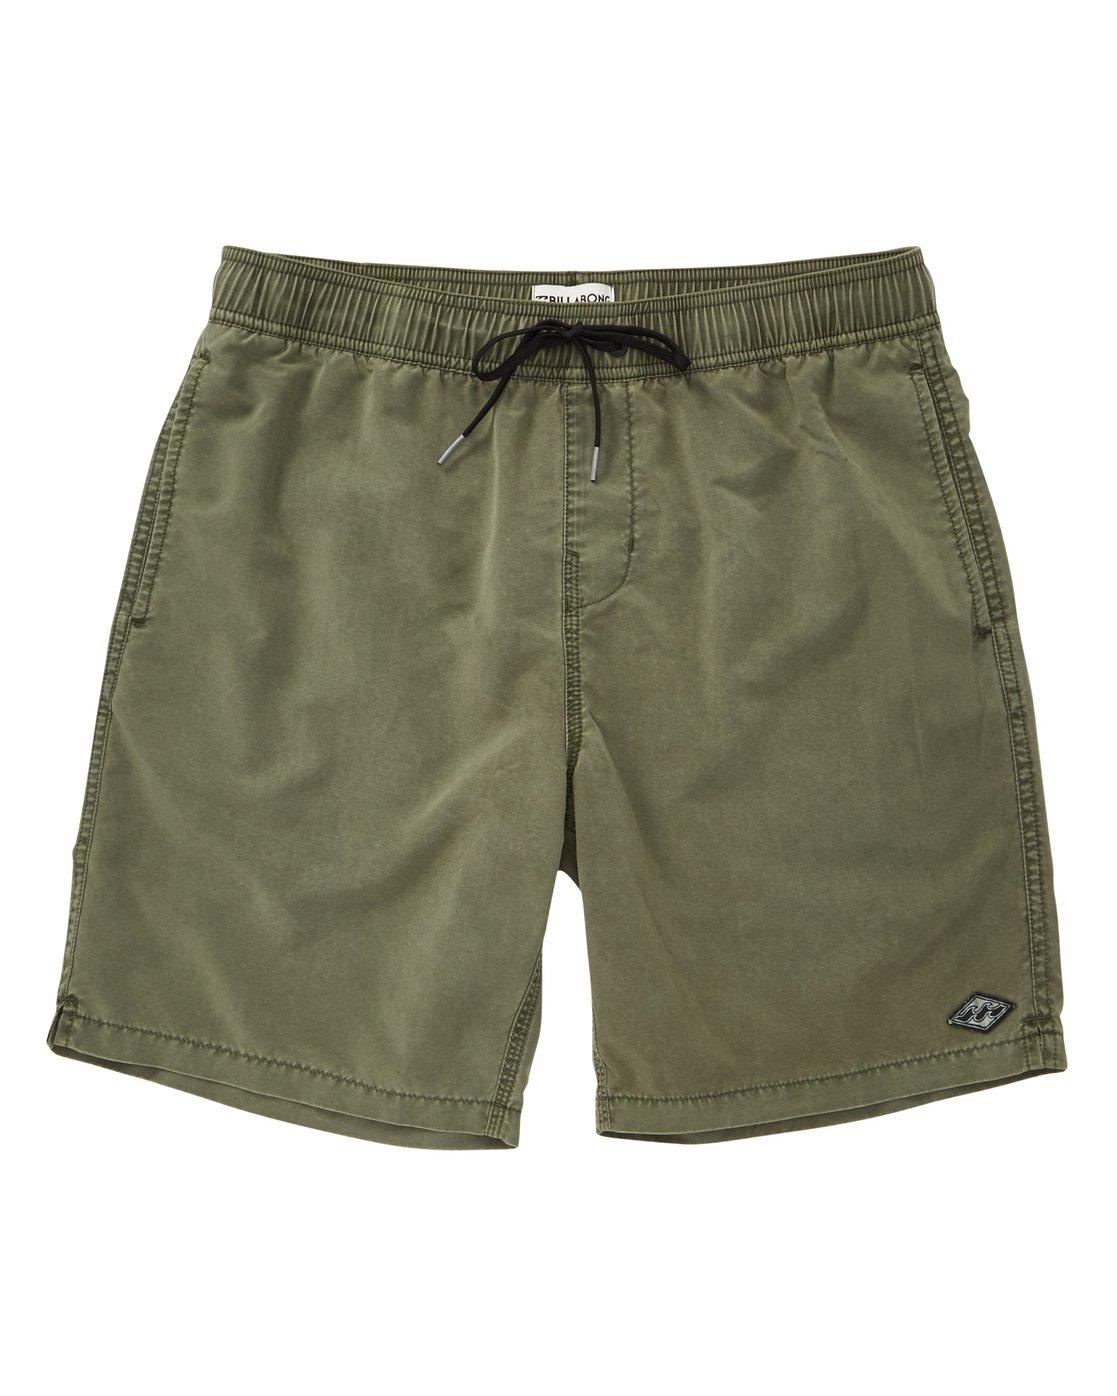 57fa1086d 0 All Day Layback Boardshorts Green M182TBAD Billabong